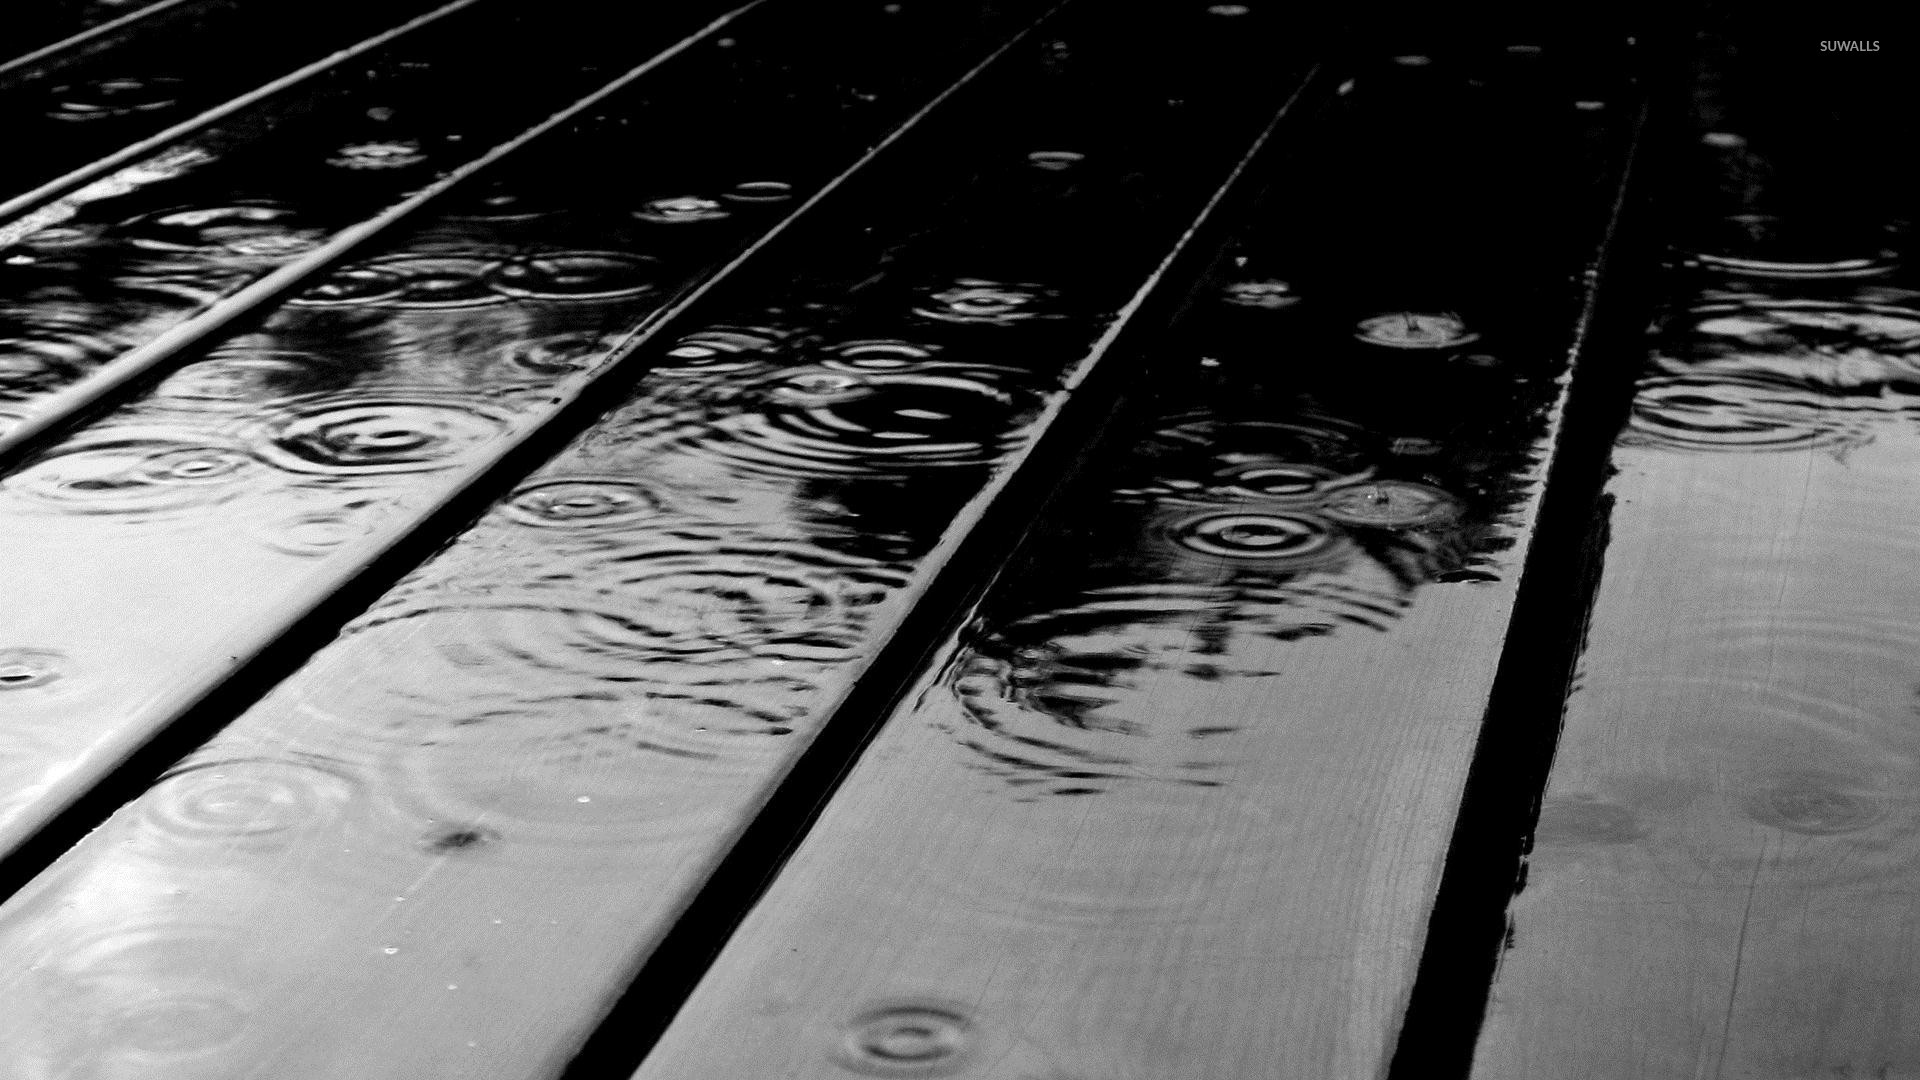 Rain [2] wallpaper - Photography wallpapers - #25726